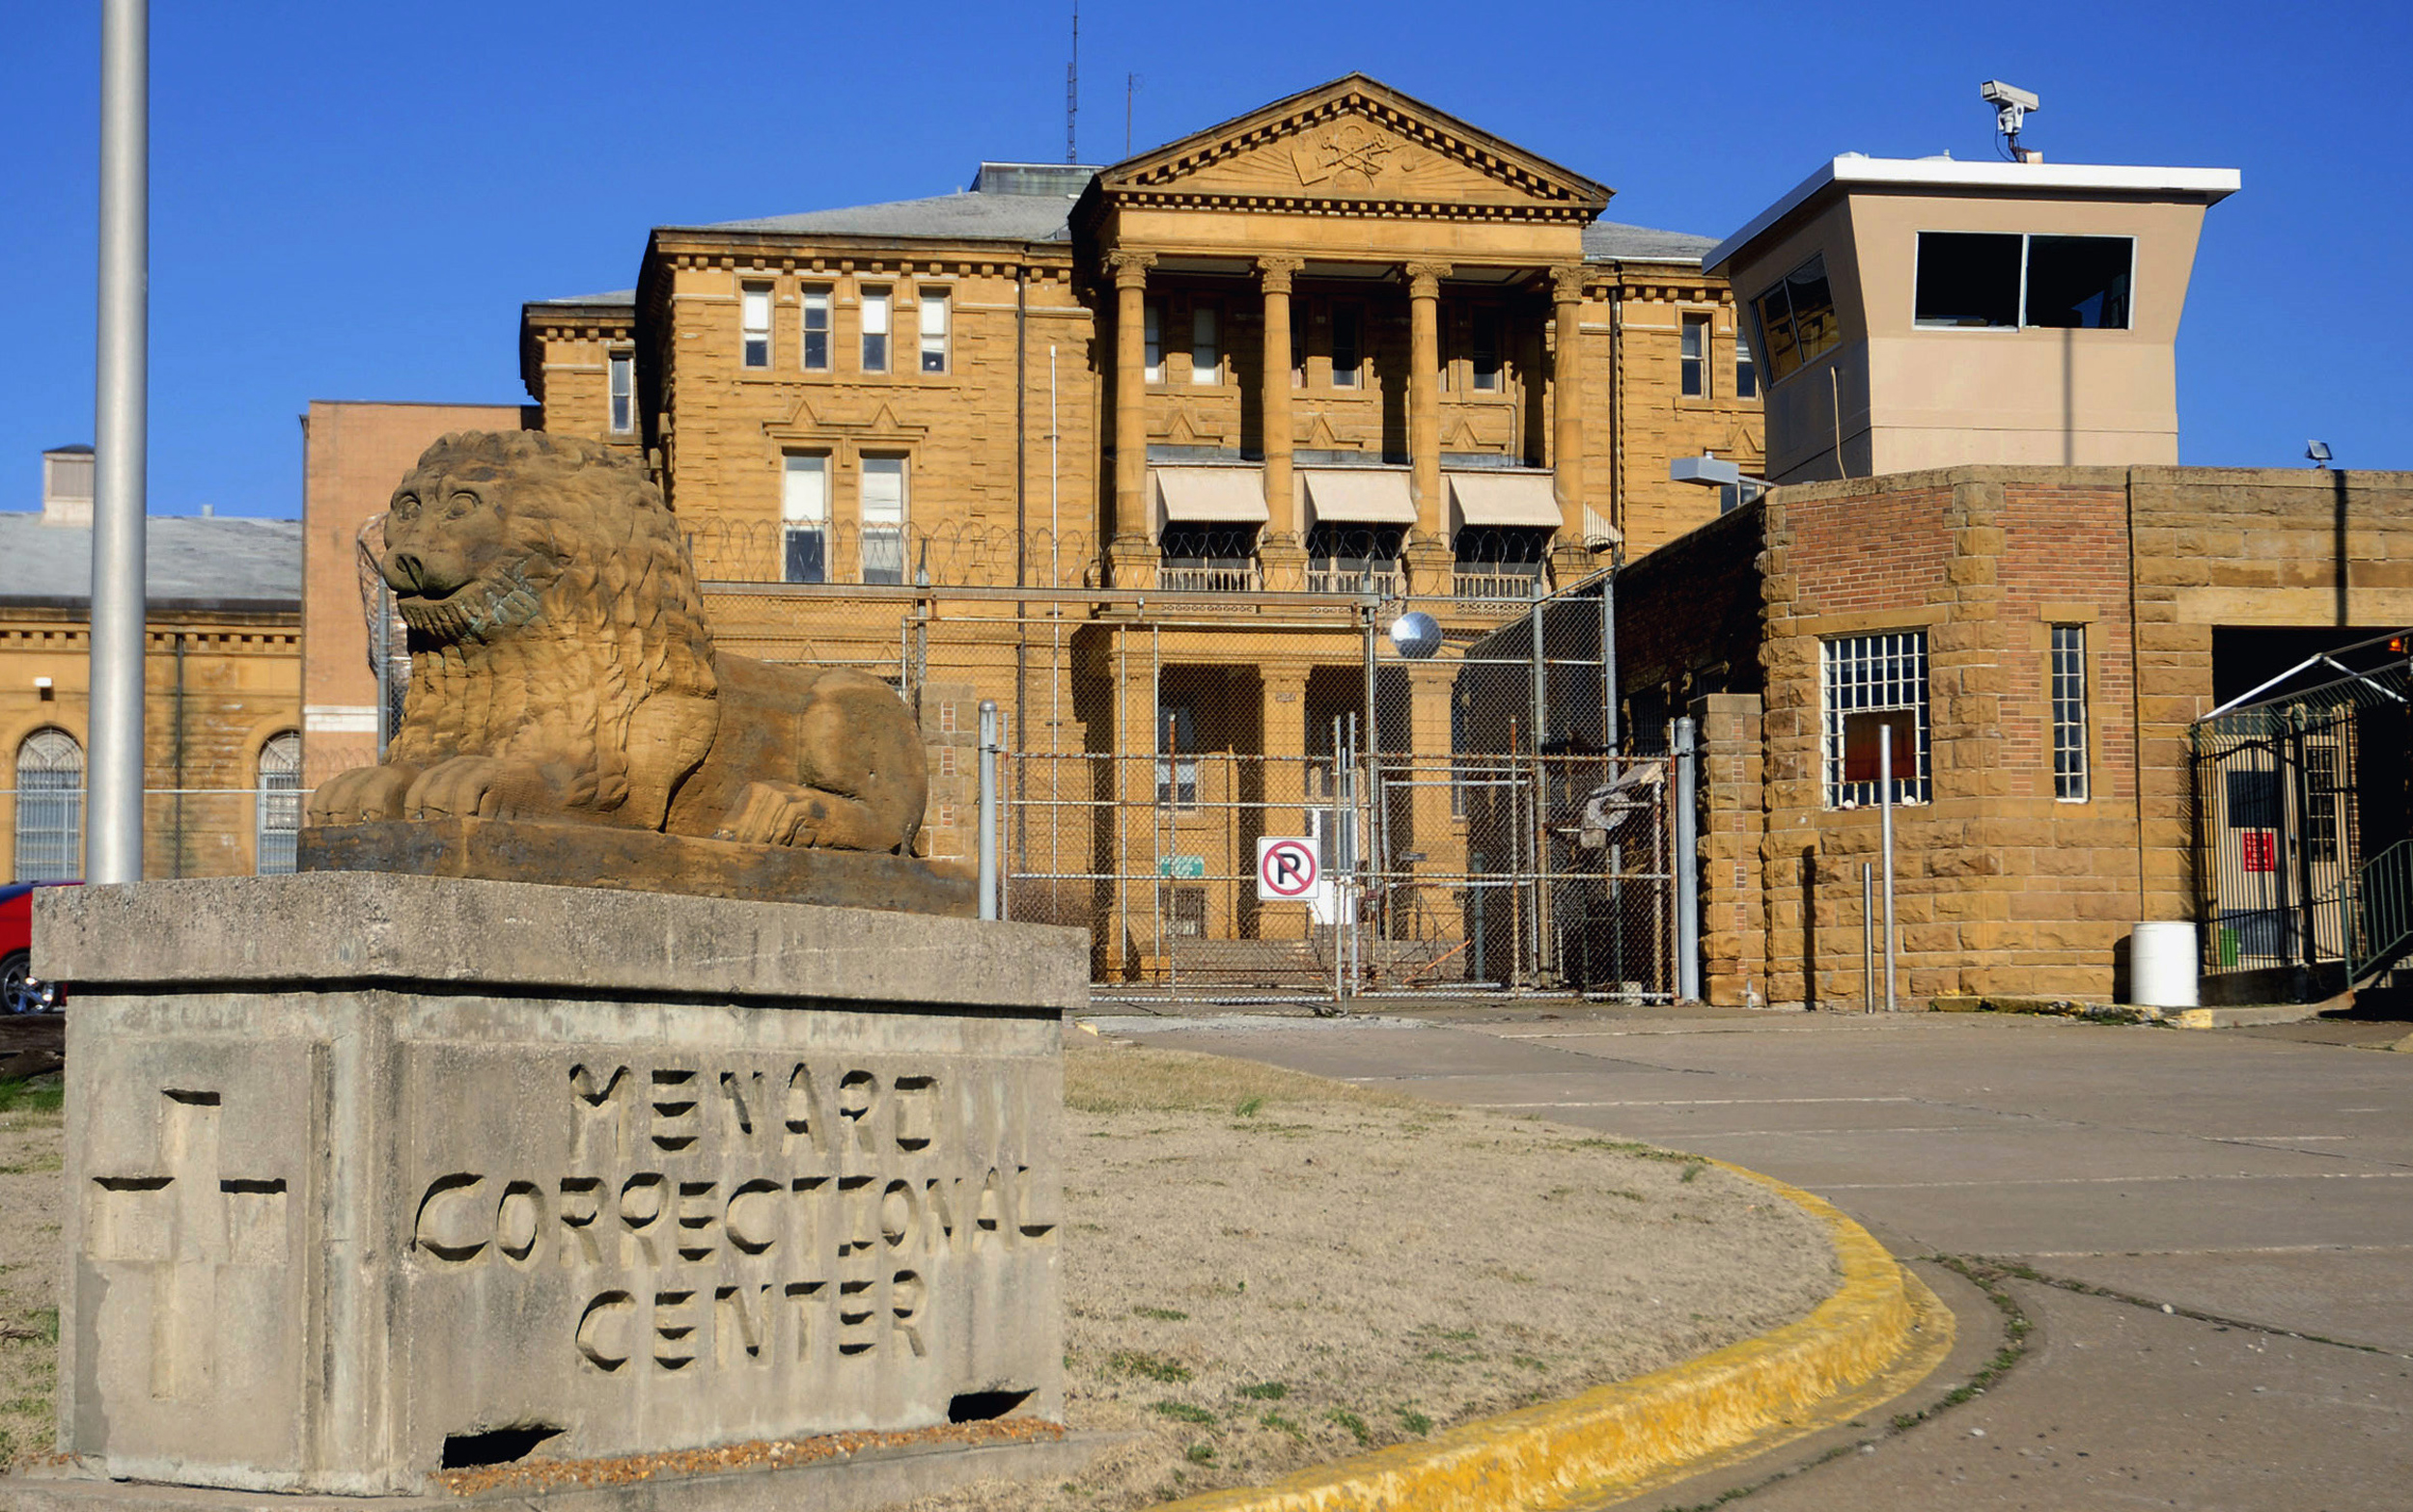 Did Illinois get bail reform right? Criminal justice advocates are optimistic